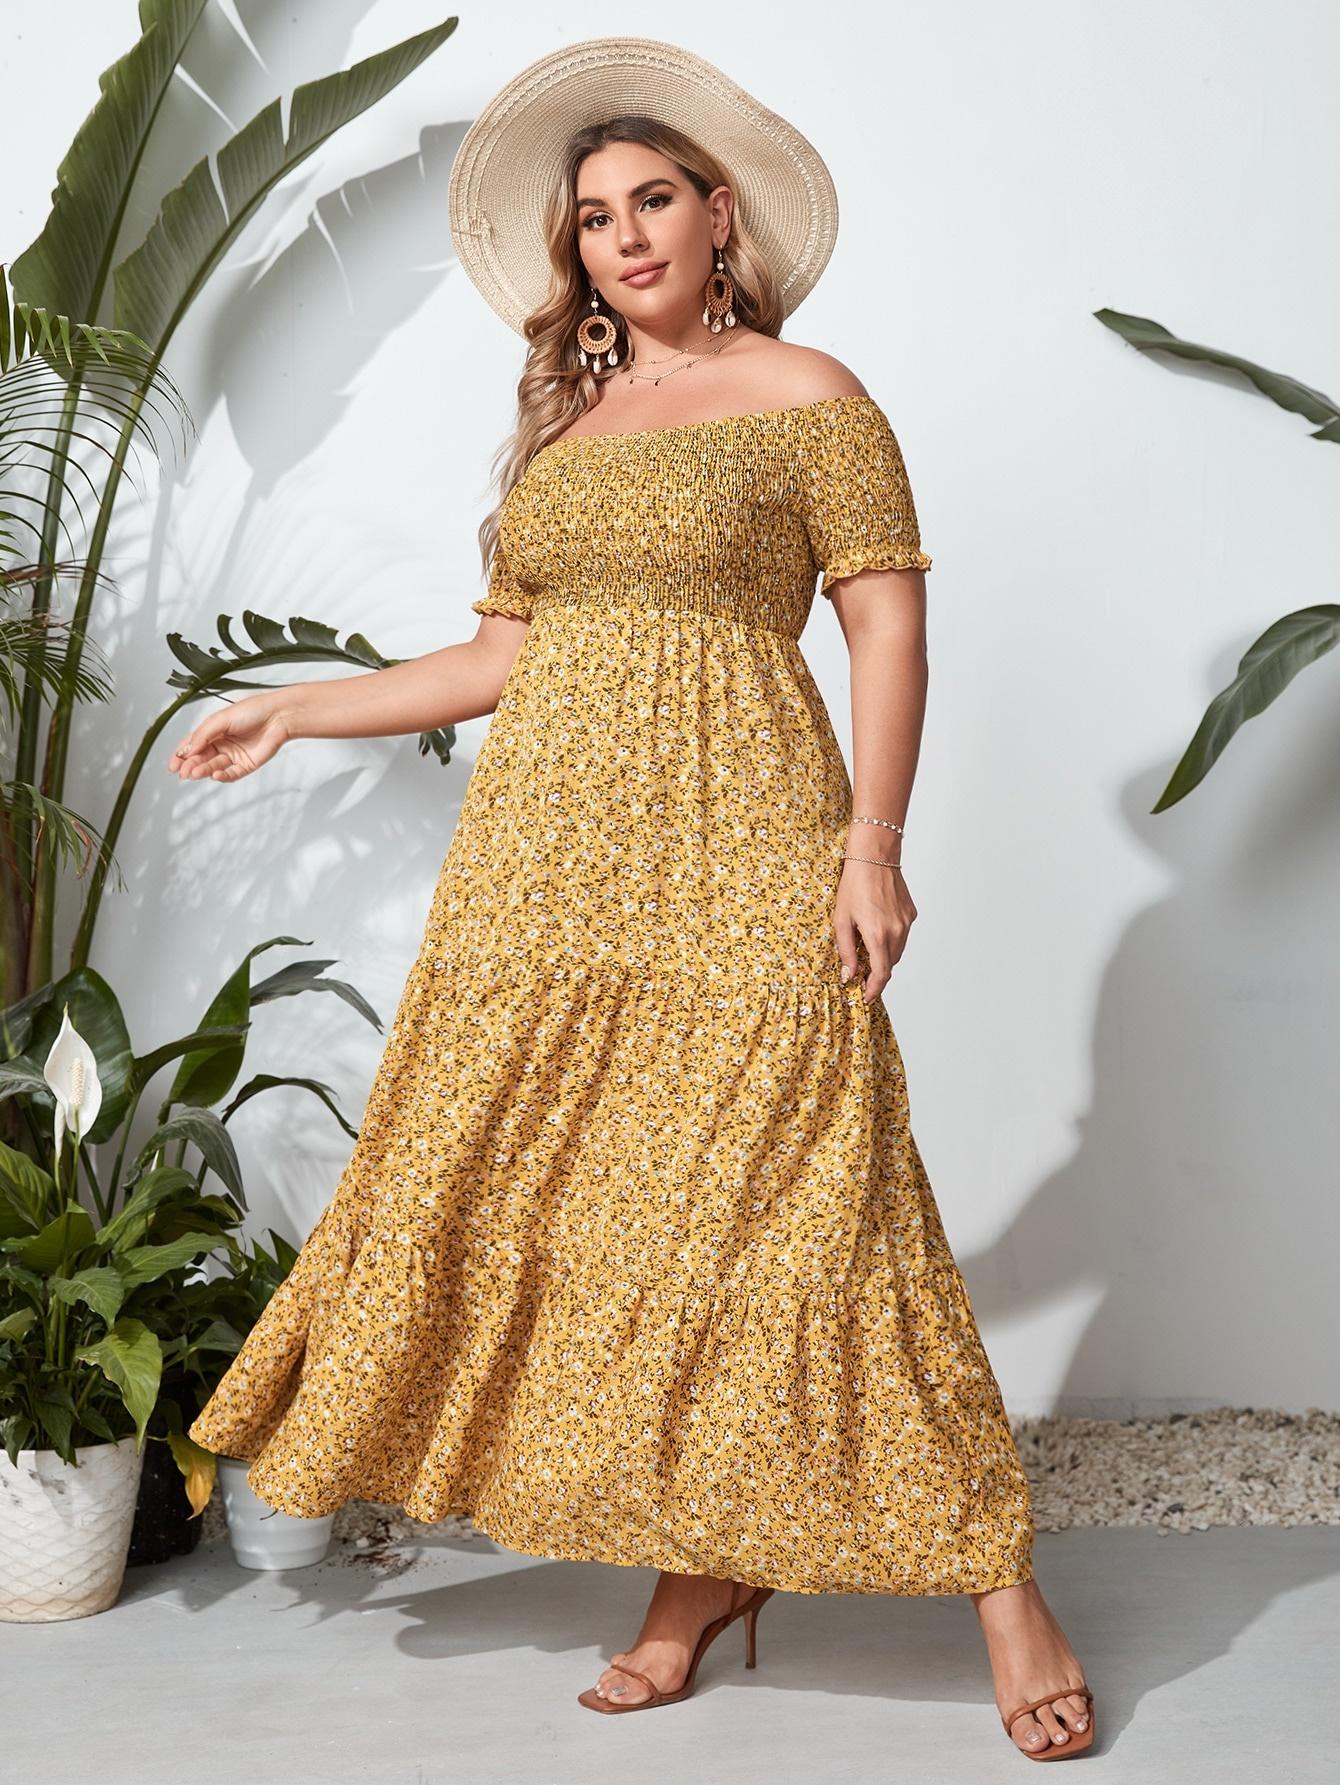 Dresses for mature women shein